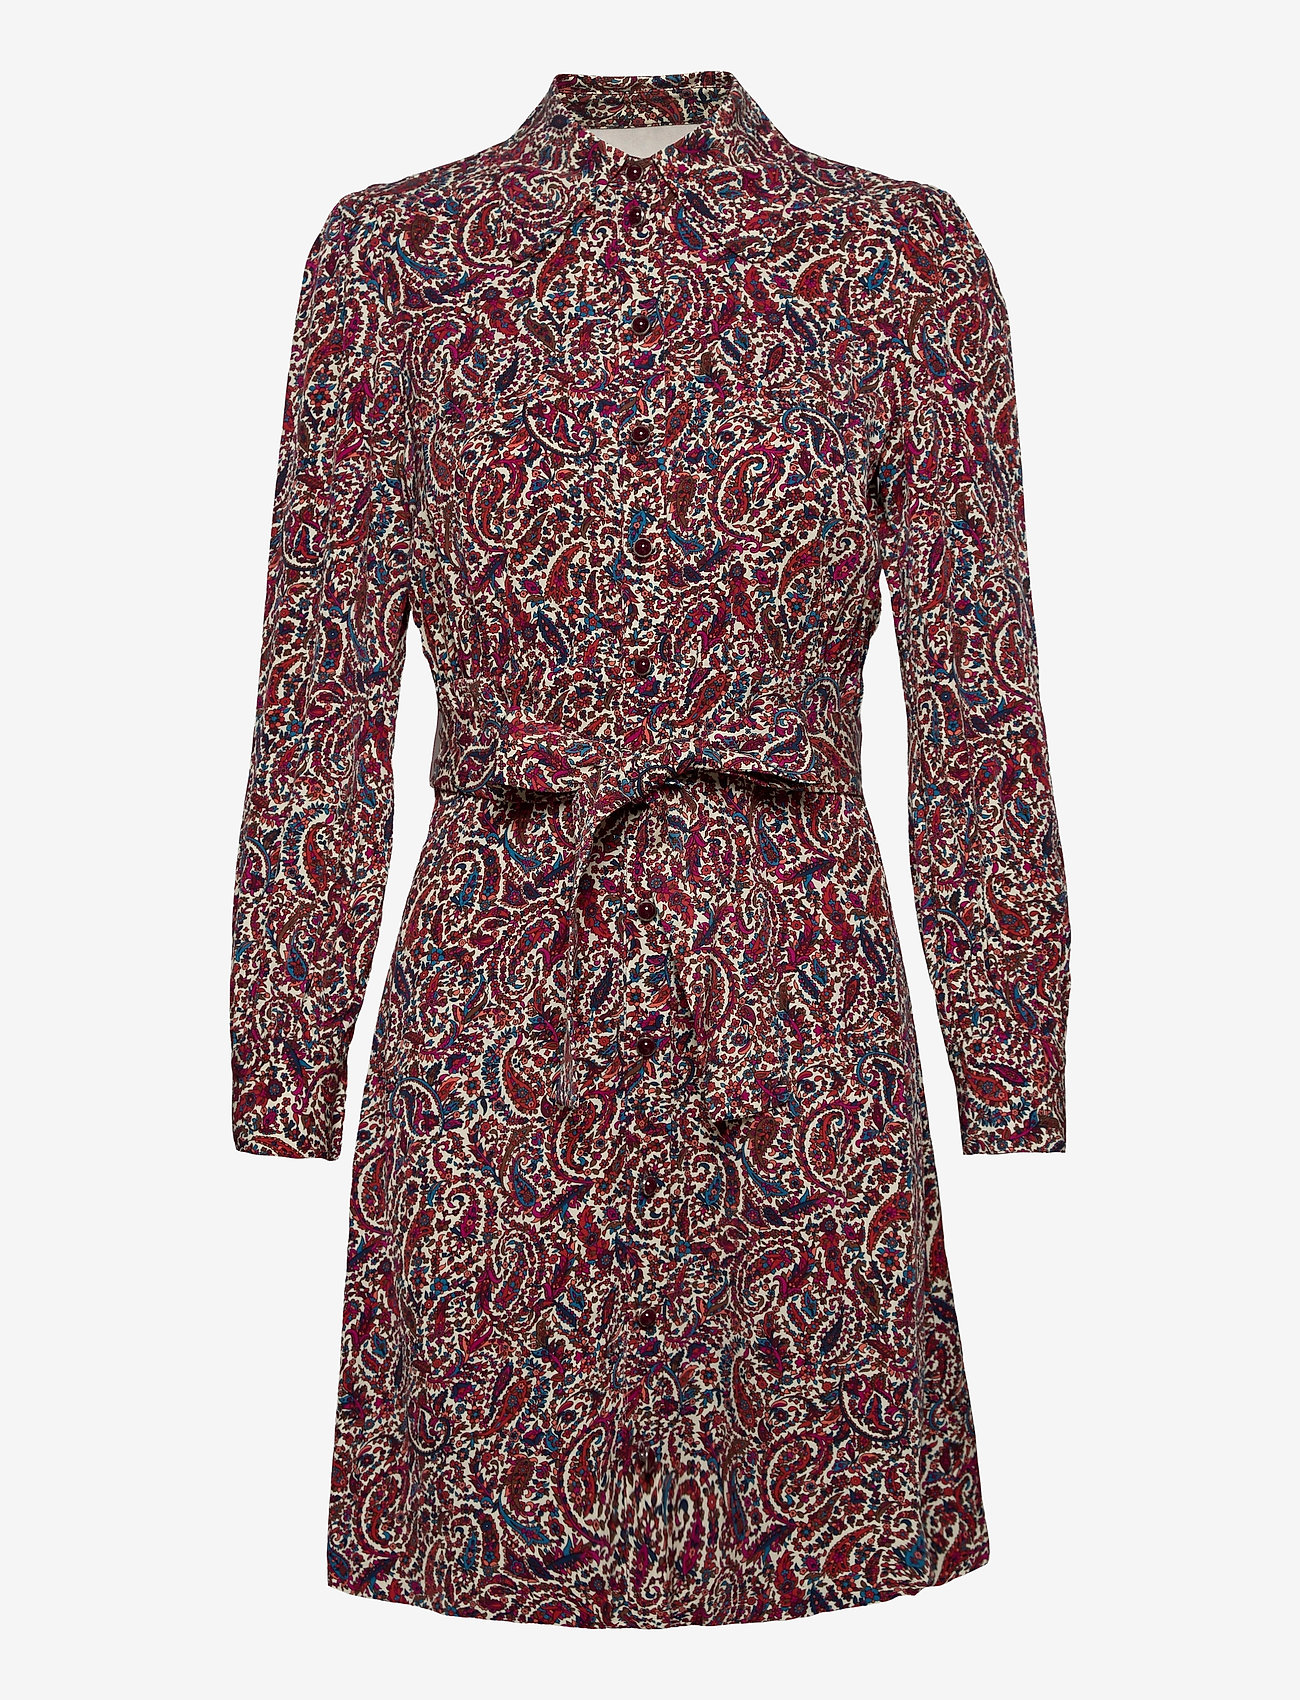 Michael Kors - LUSH PSLY GARDN DRESS - alledaagse jurken - dark ruby - 0